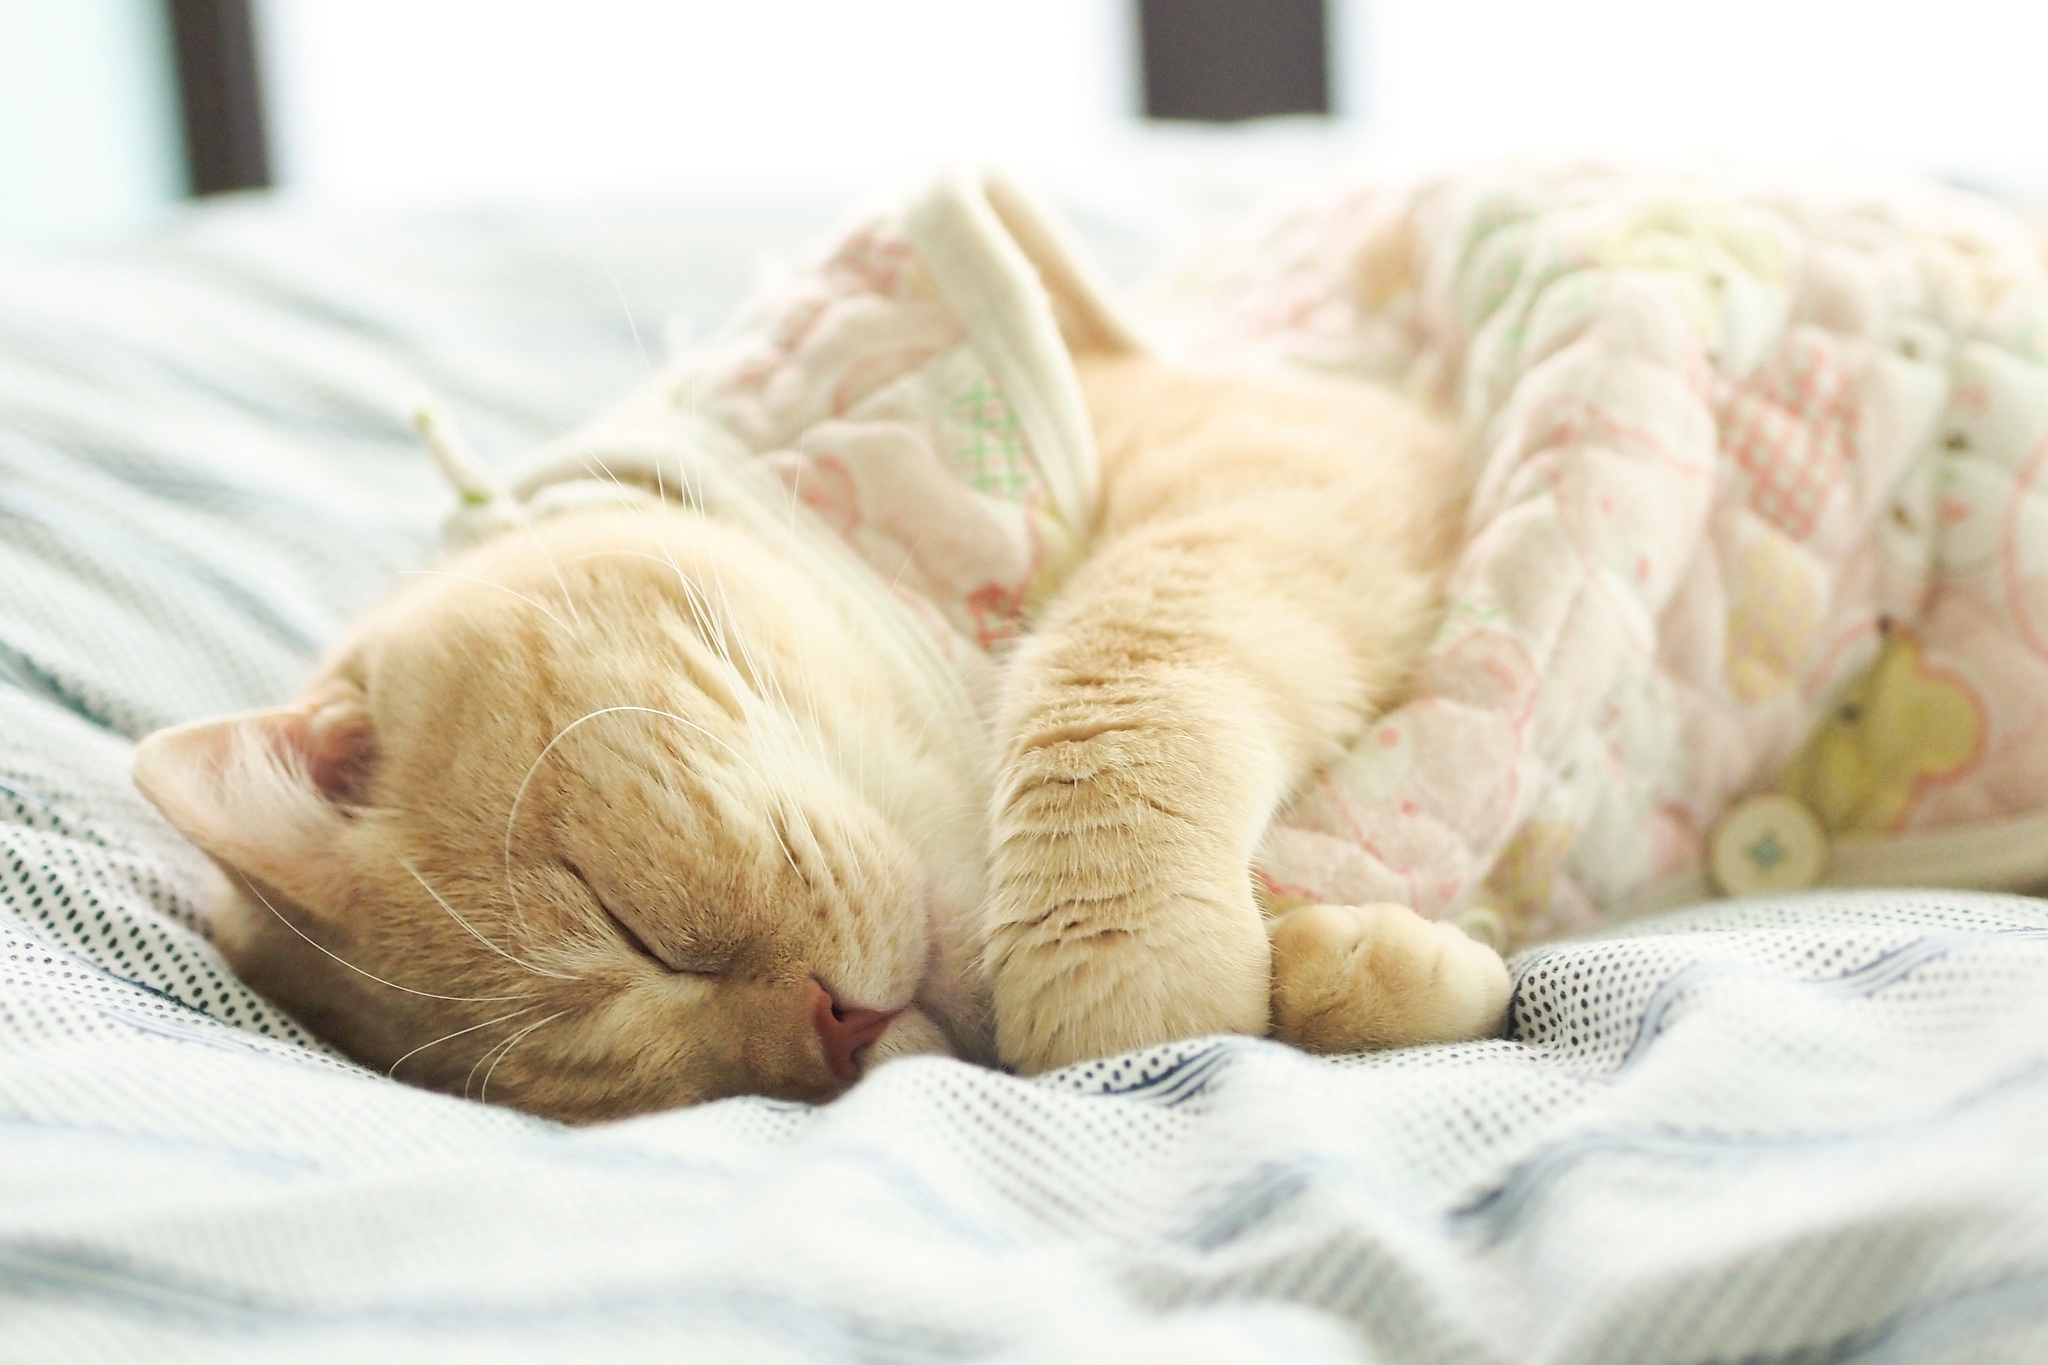 Кошка спит в кровати картинка